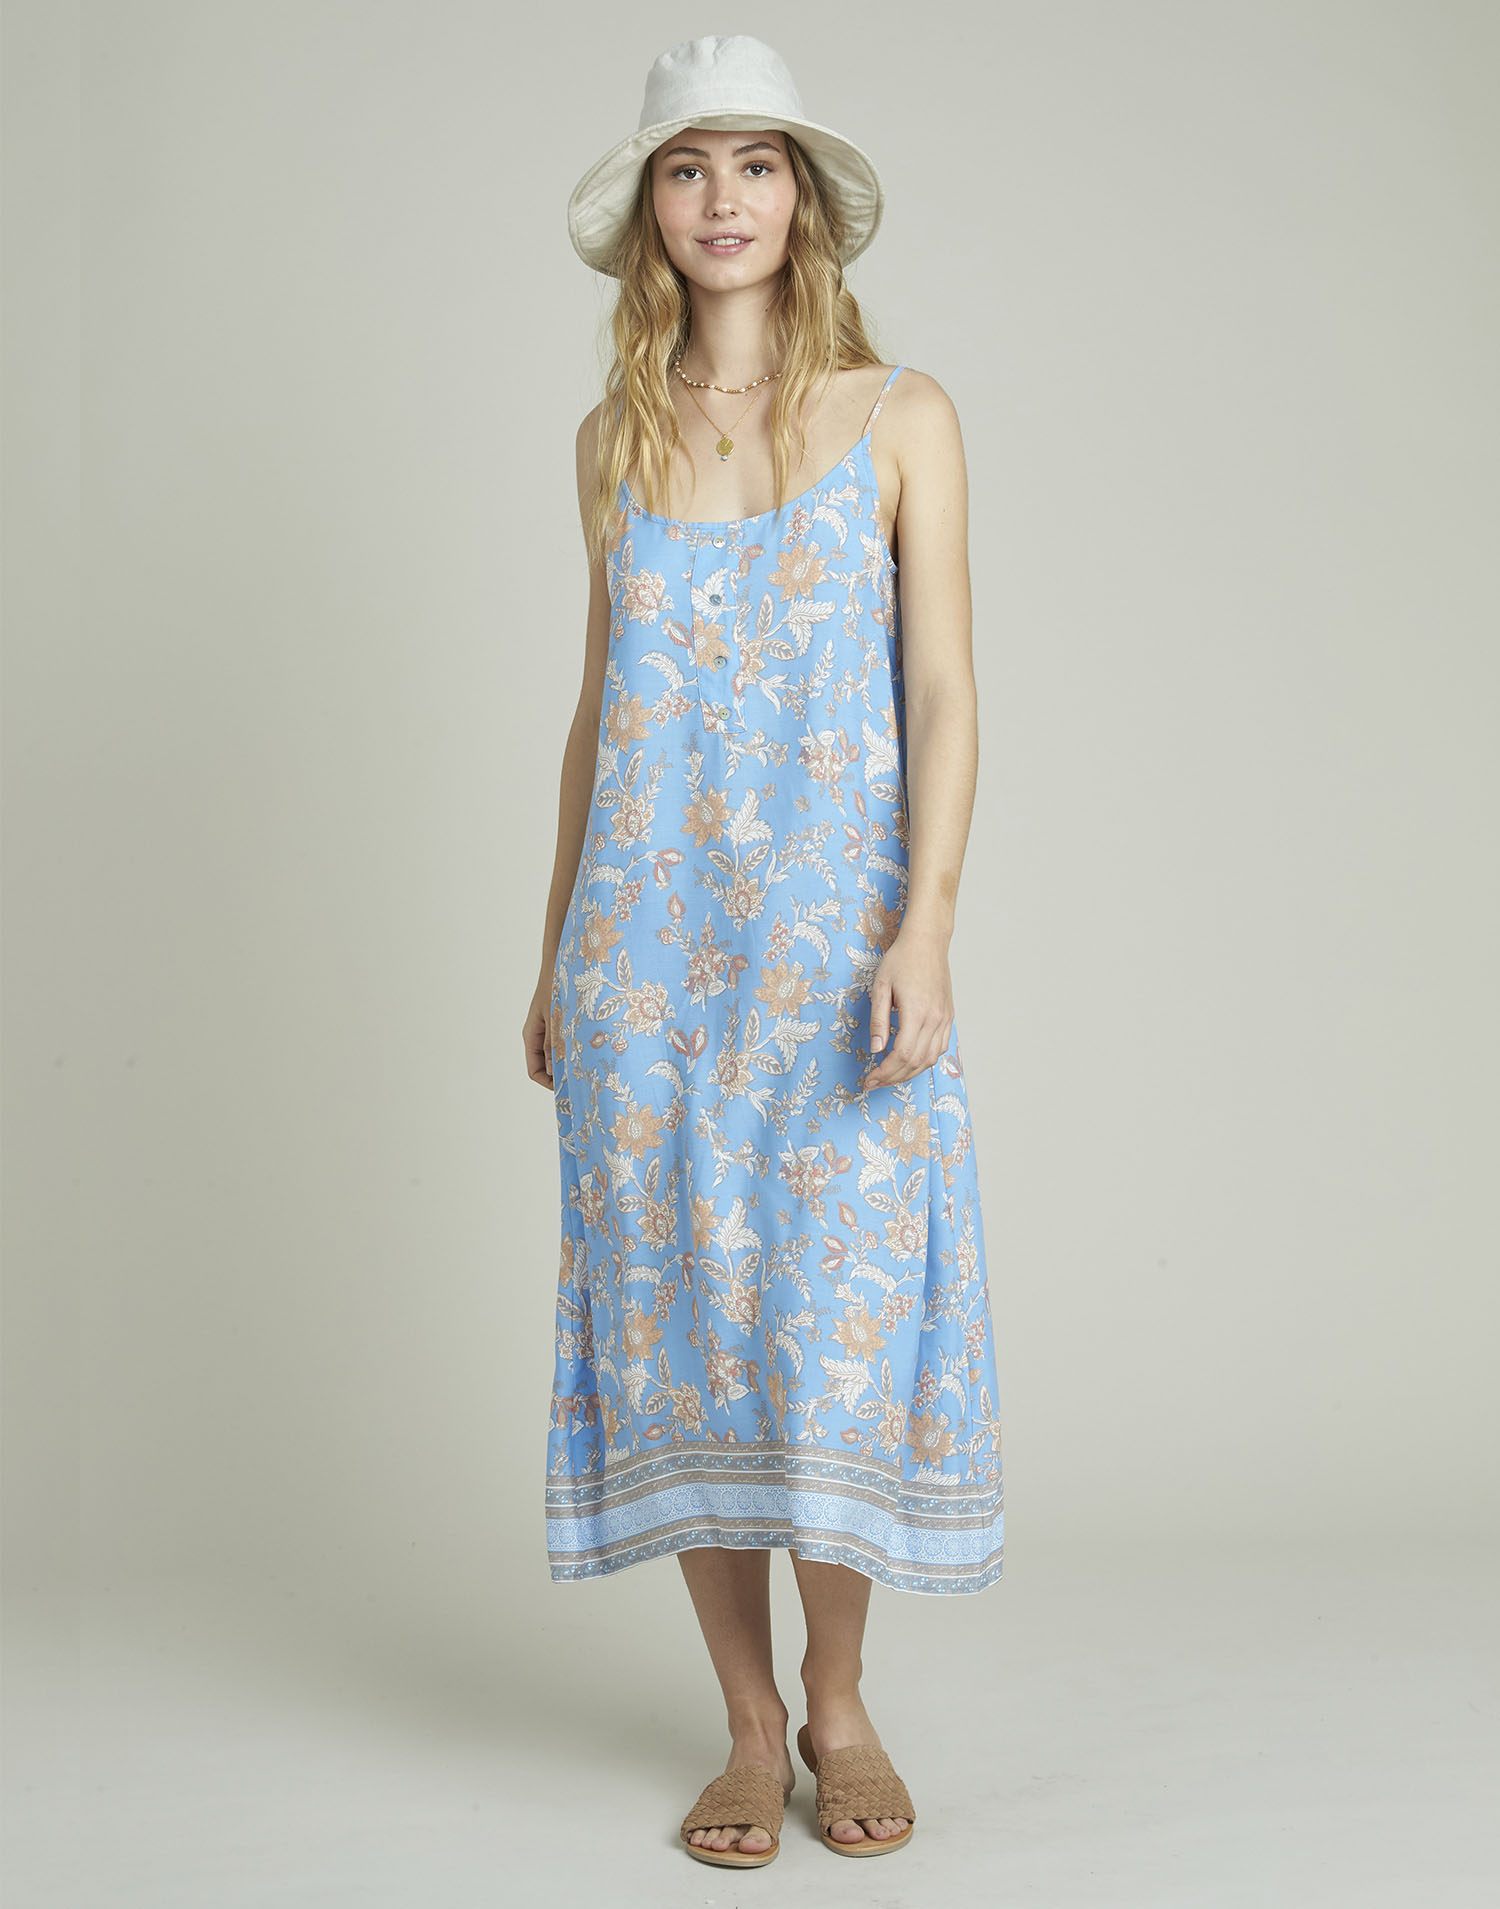 Floral print long strappy dress